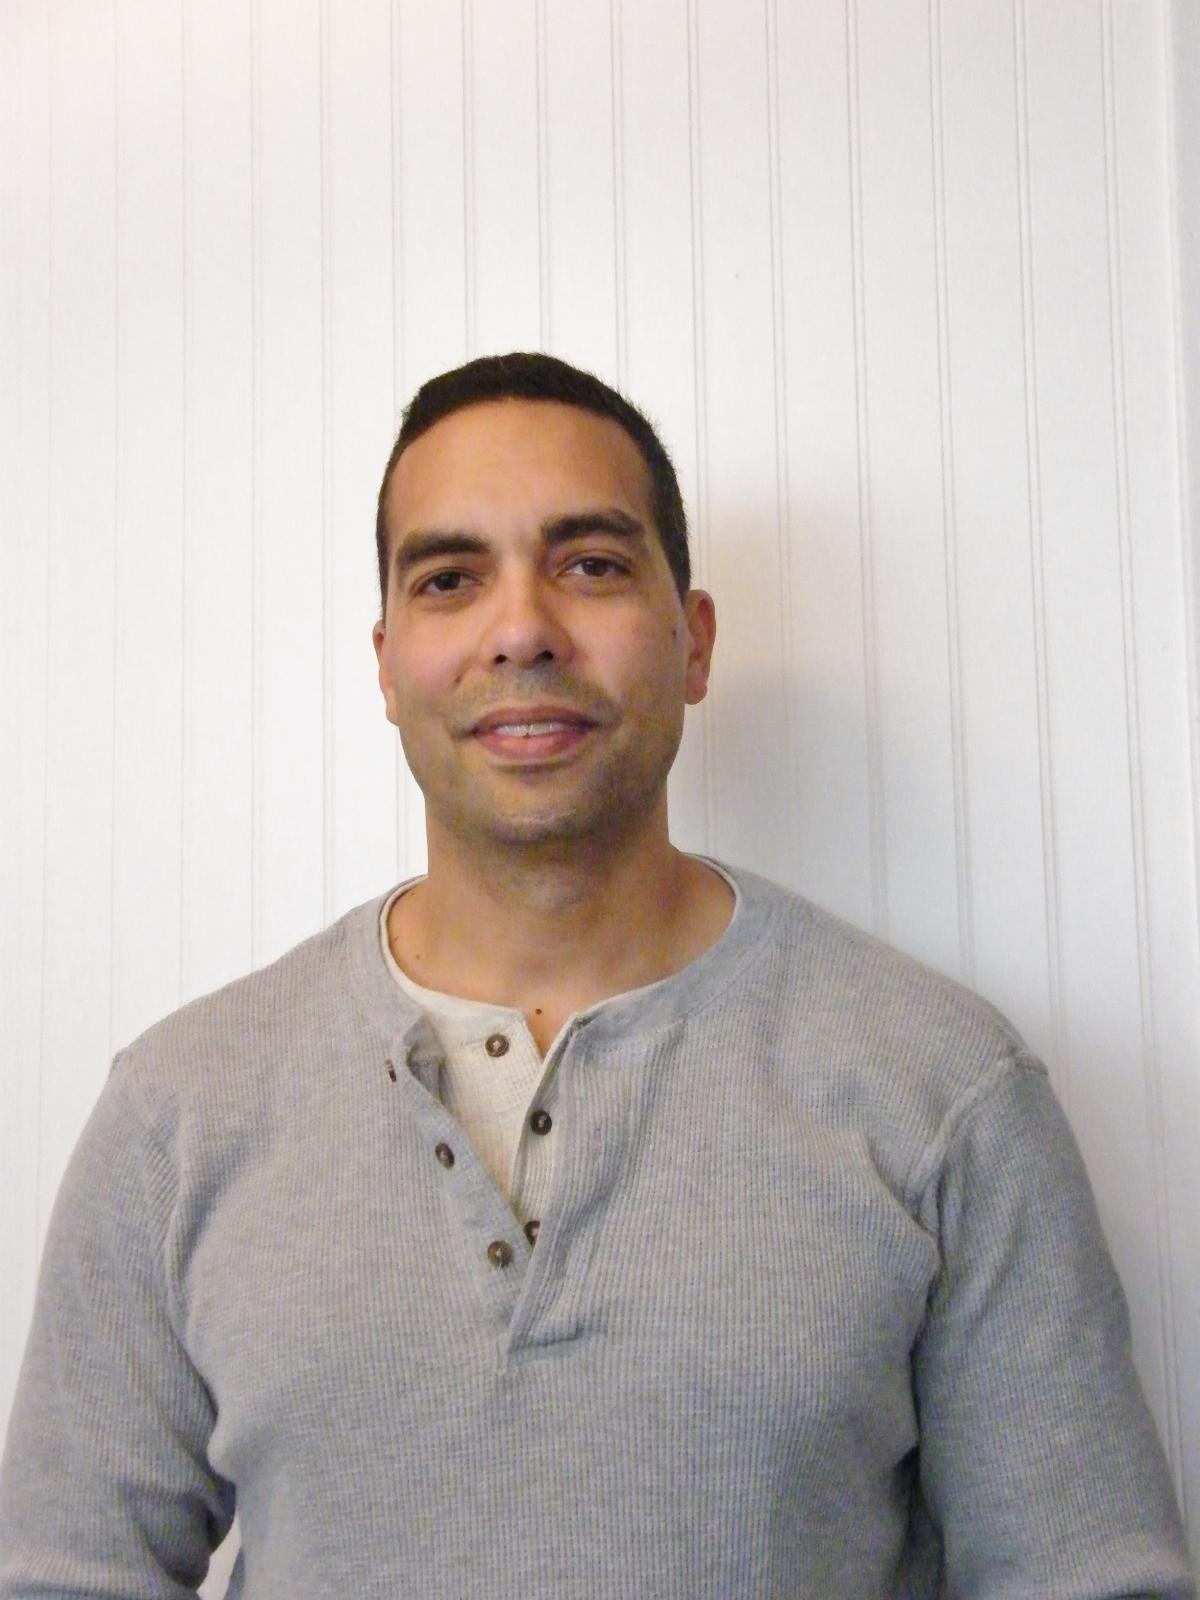 Author Interview with JasonArias